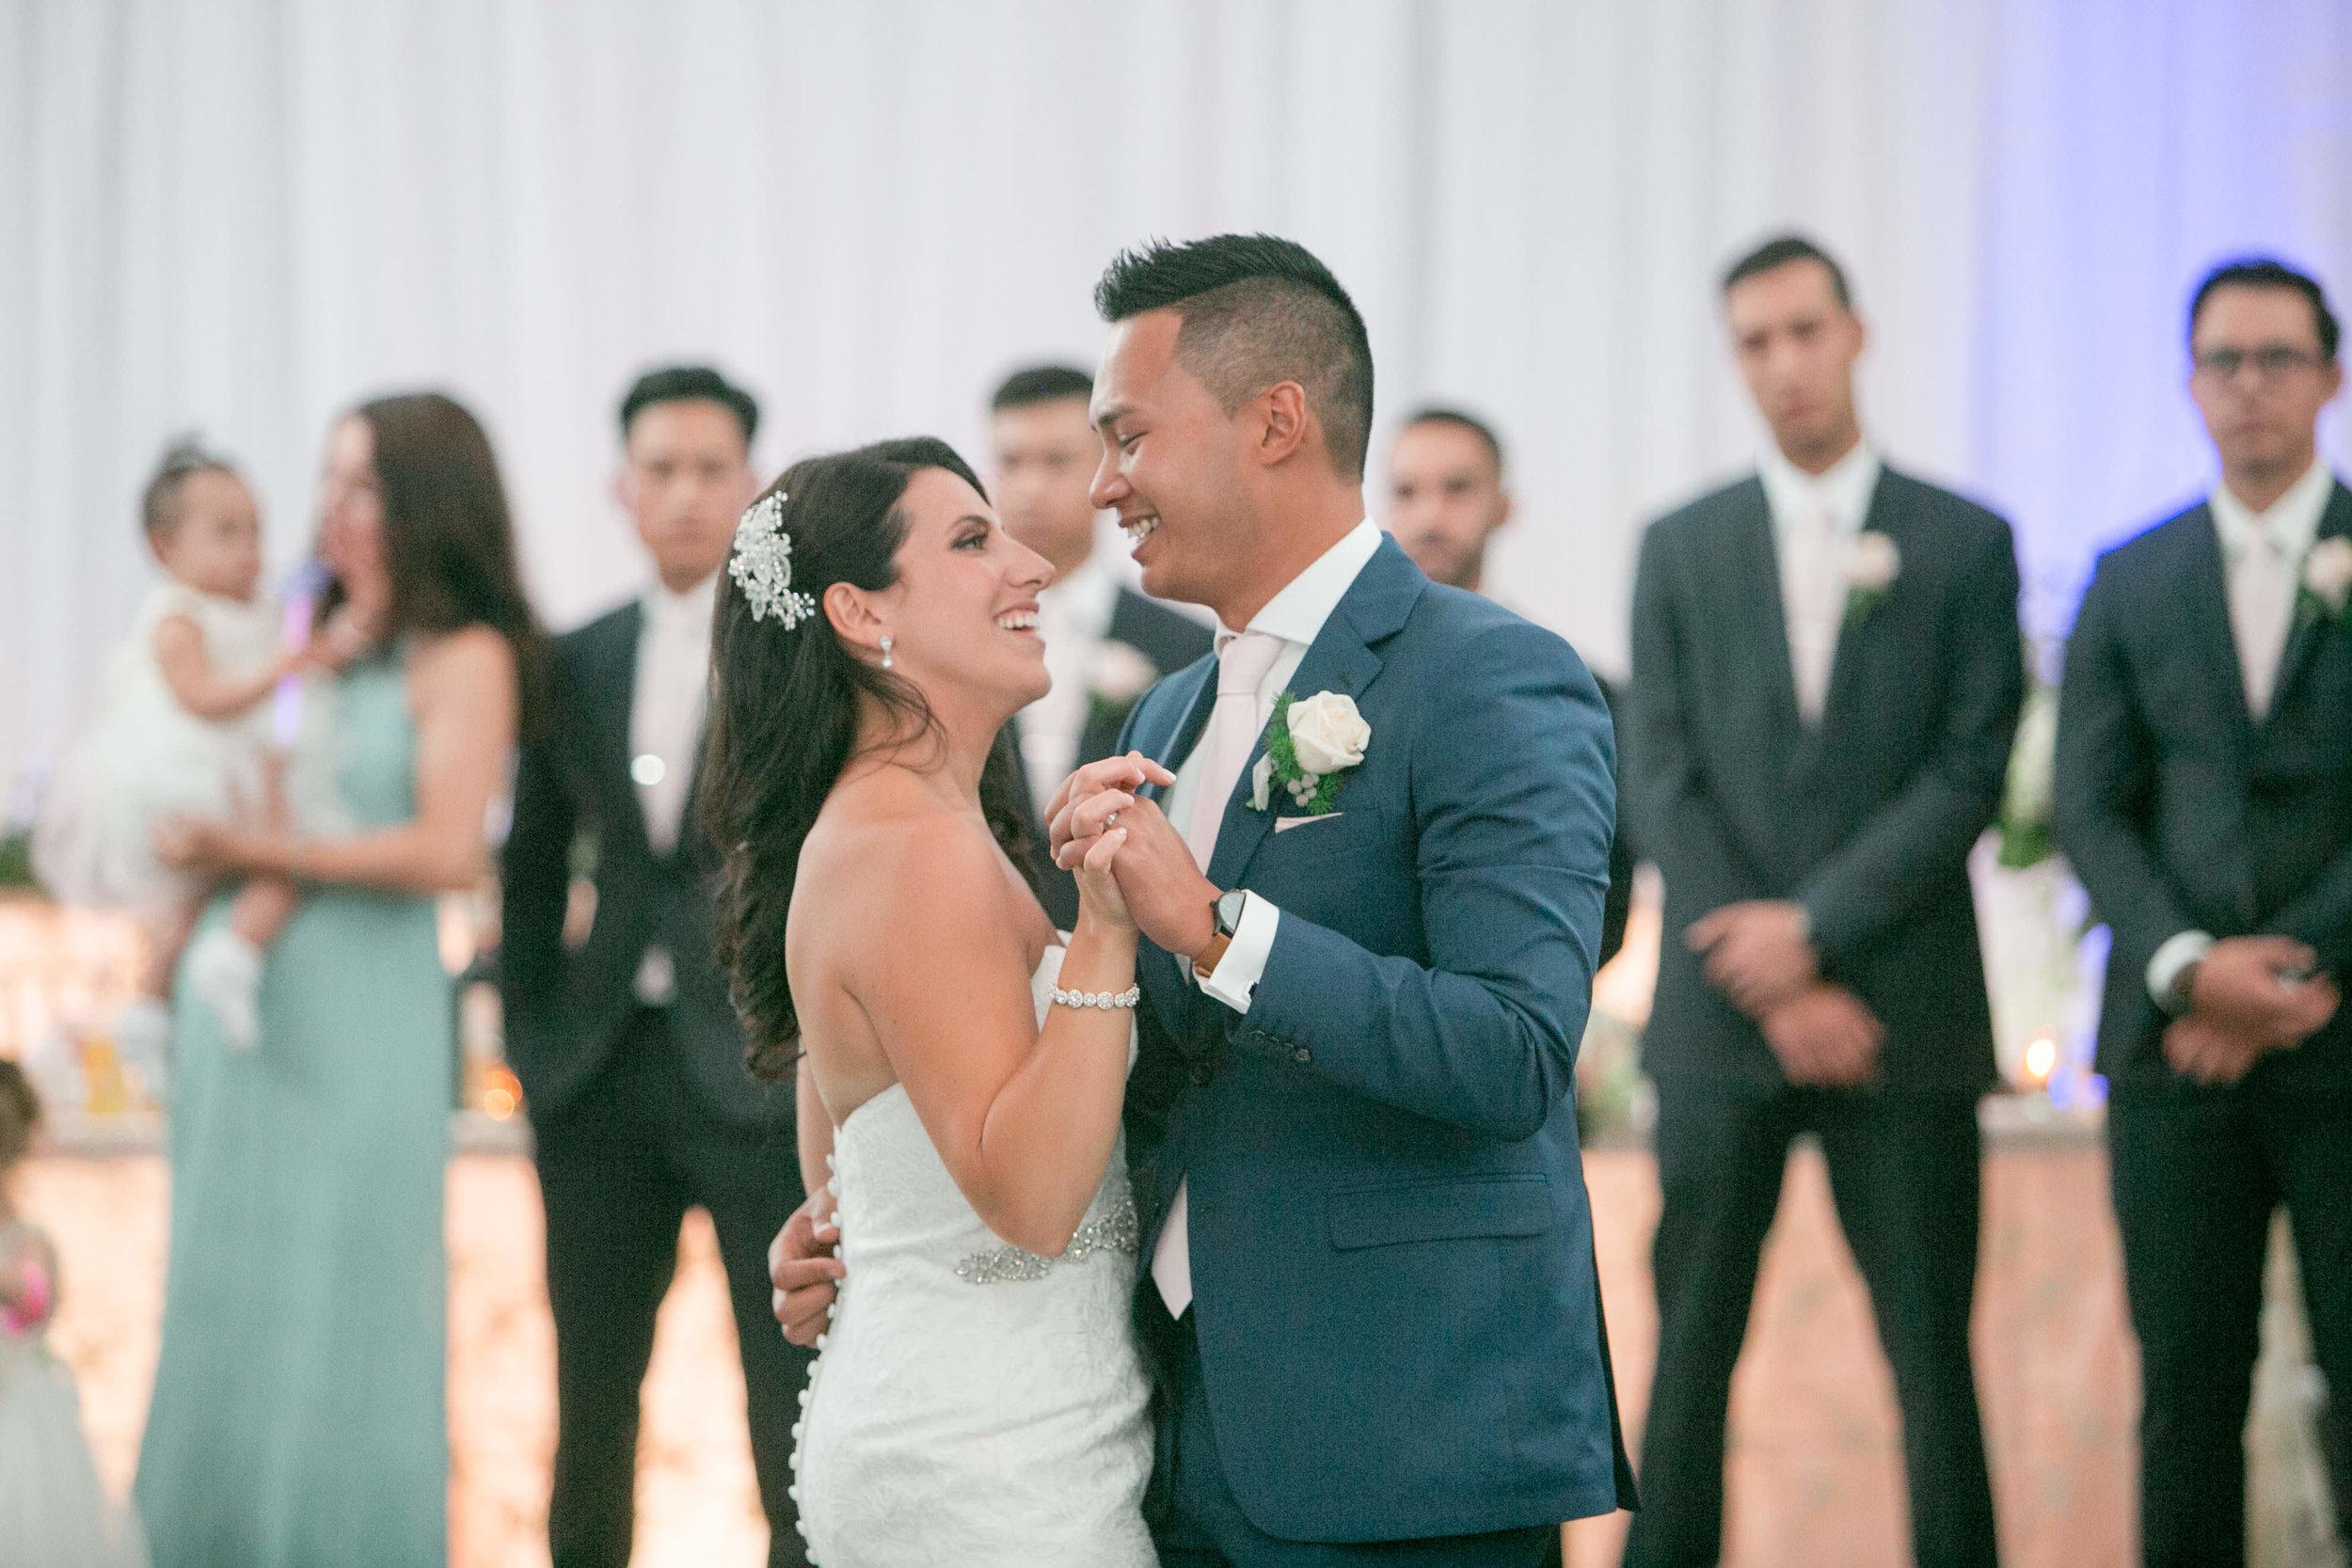 Stefanie___Bernard___Daniel_Ricci_Weddings_High_Res._Finals__542.jpg